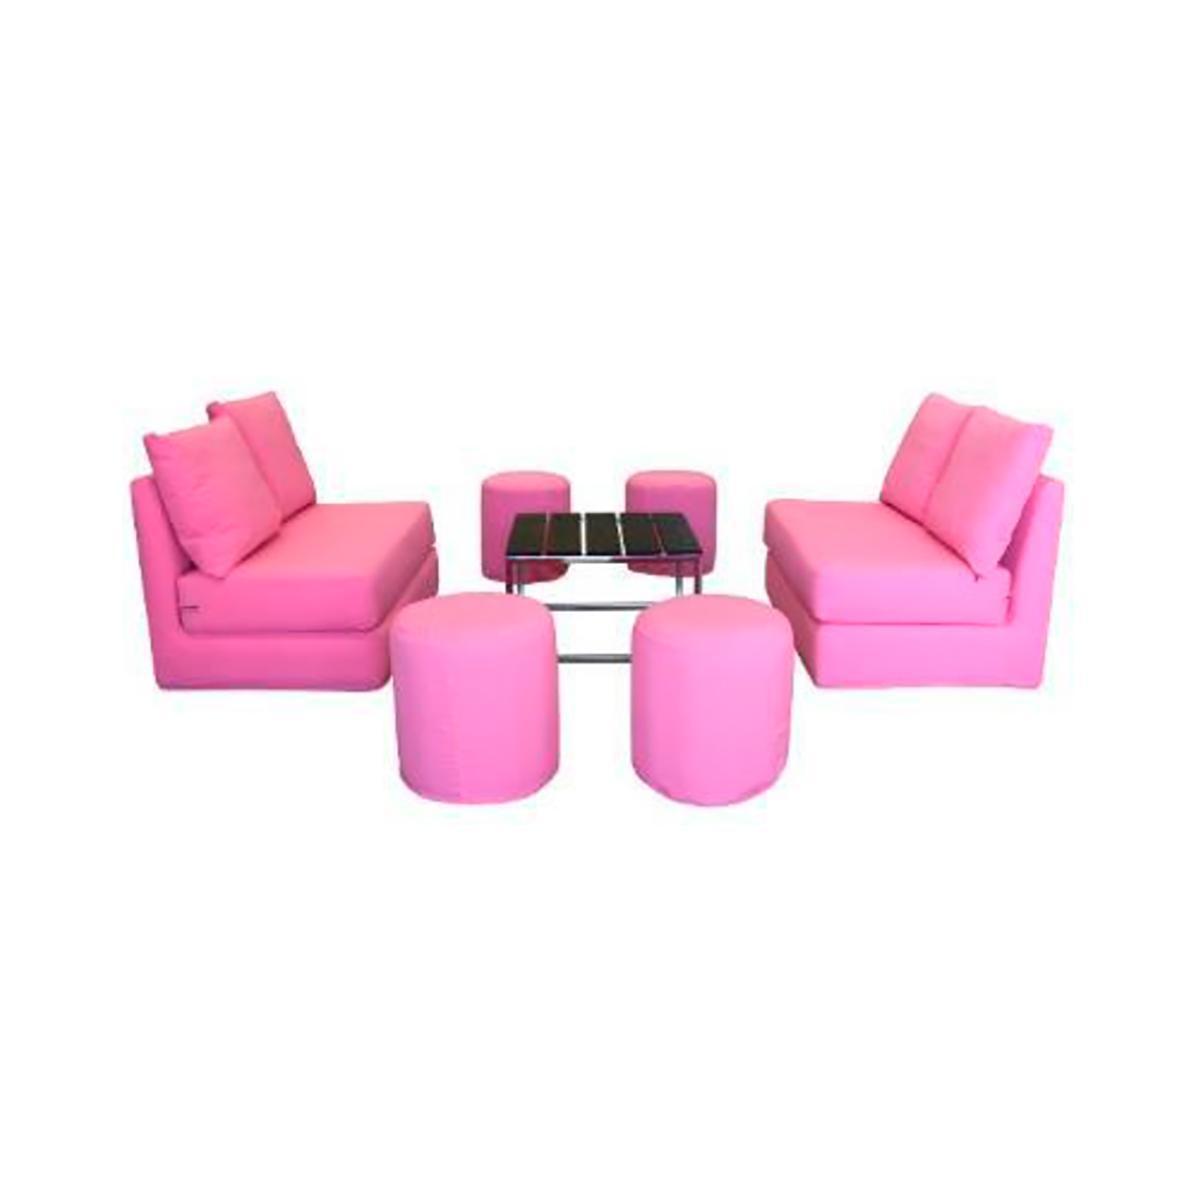 Sala cube 2 love seat rosa